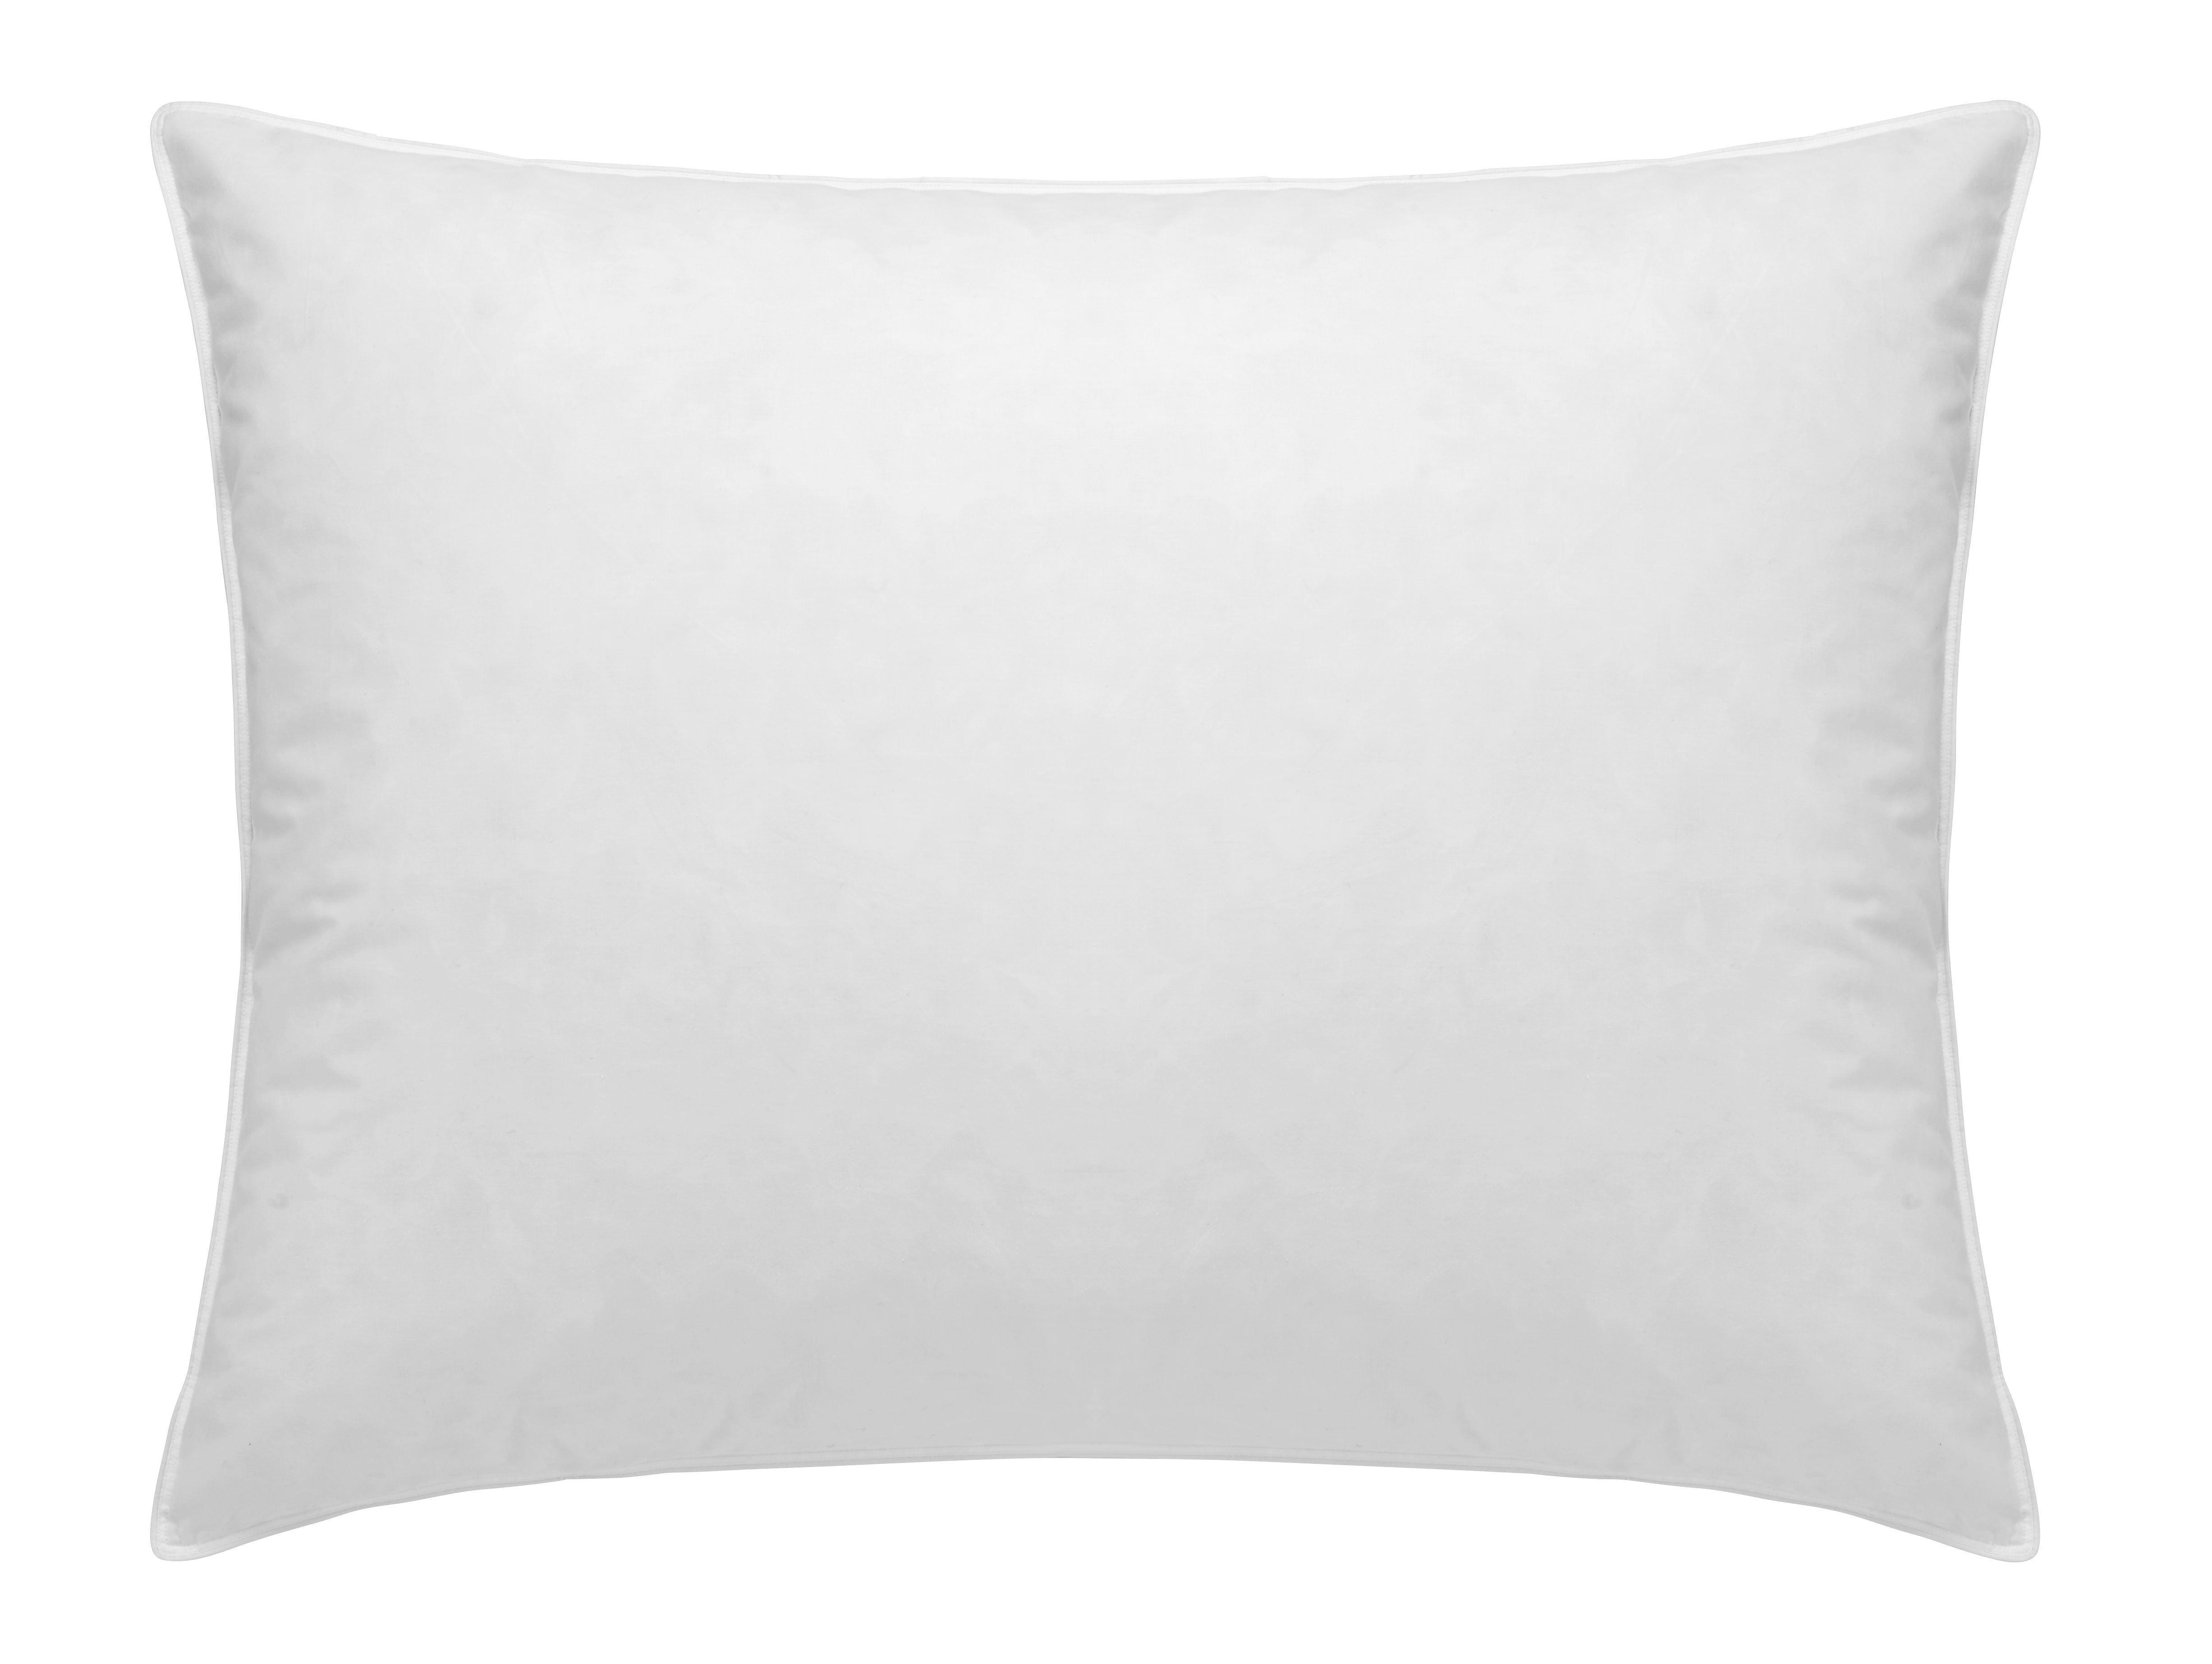 3-kammer-kissen Vanessa - Textil (80/80cm) - MÖMAX modern living